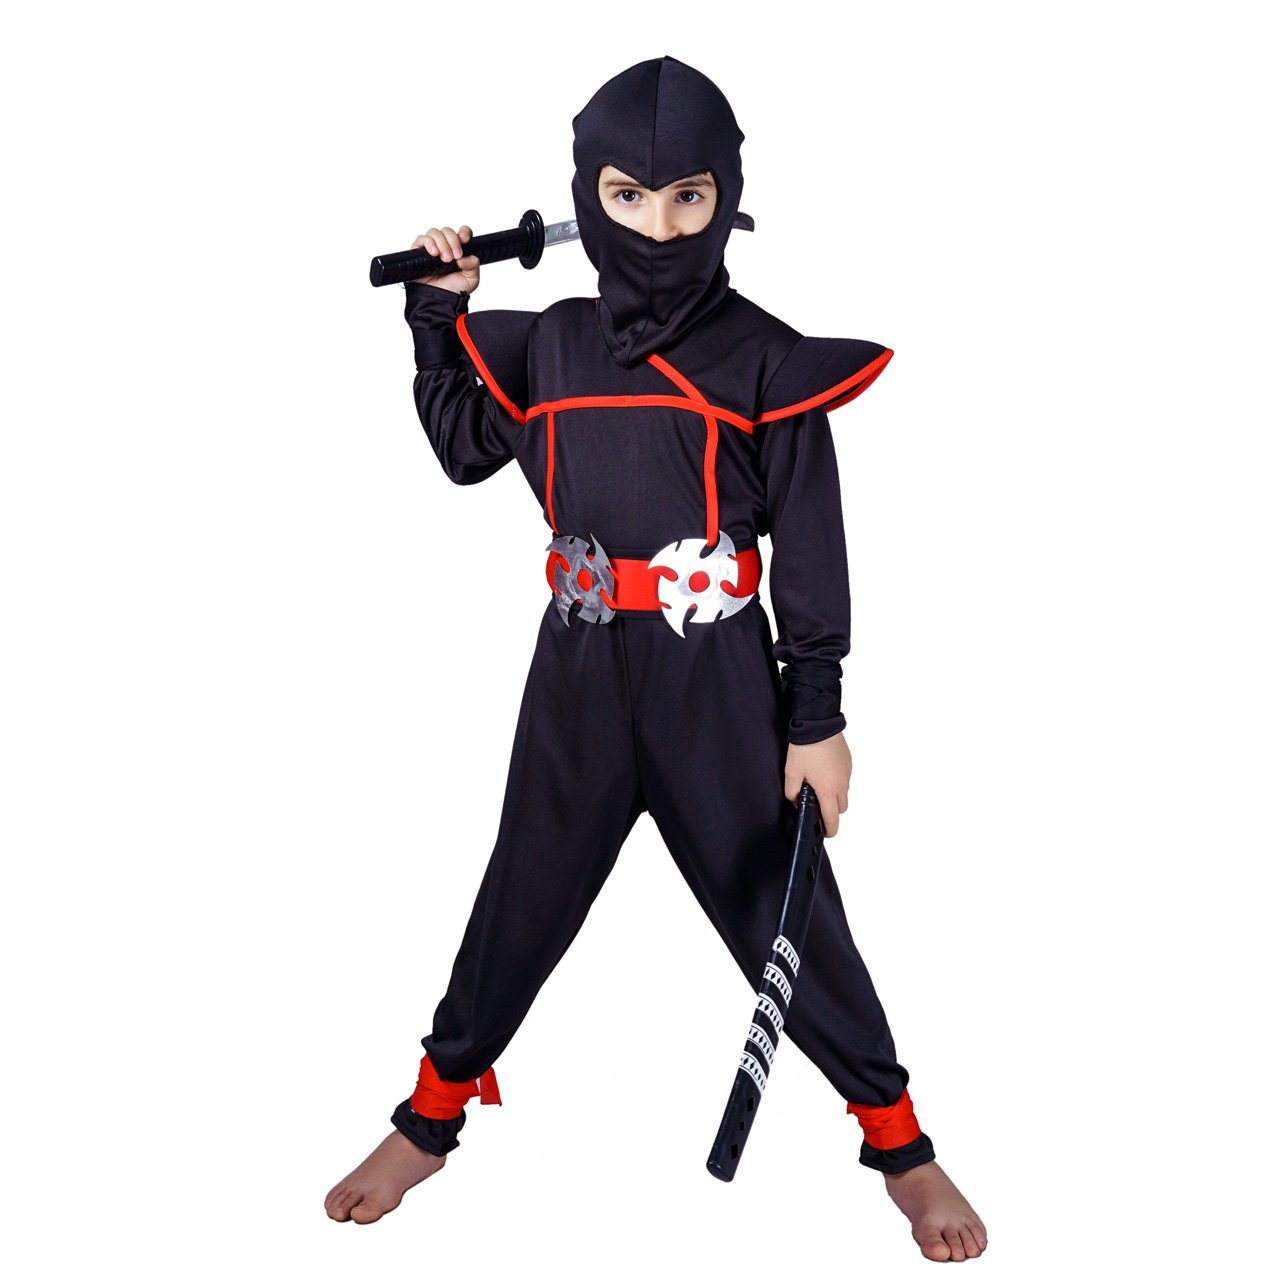 Amazon.com: Flatwhite disfraces infantiles de ninja: Clothing